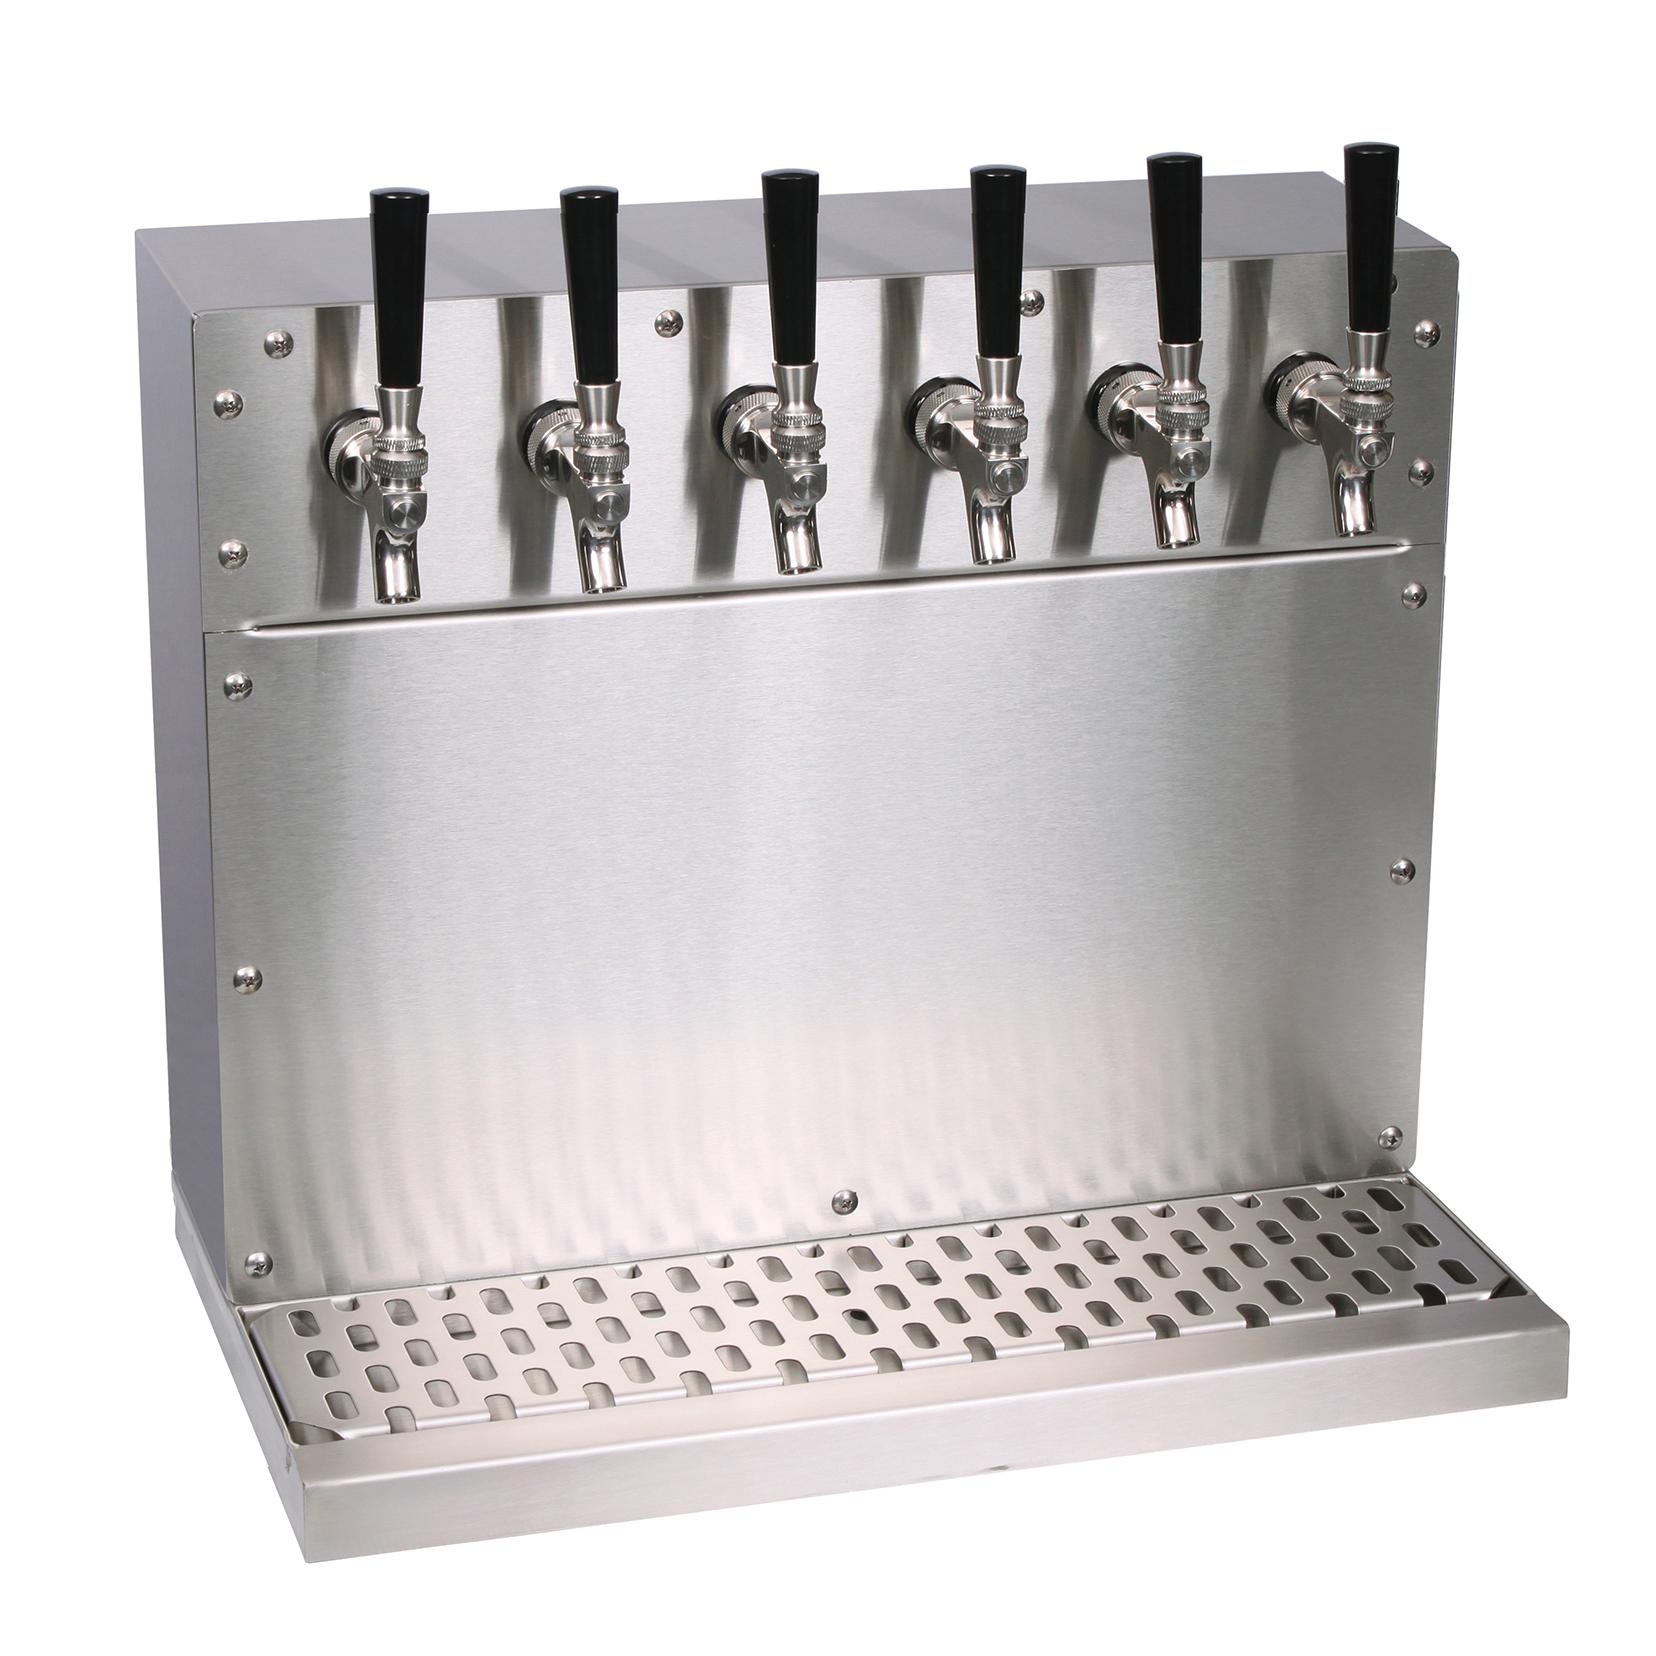 Glastender WT-8-SSR draft beer / wine dispensing tower